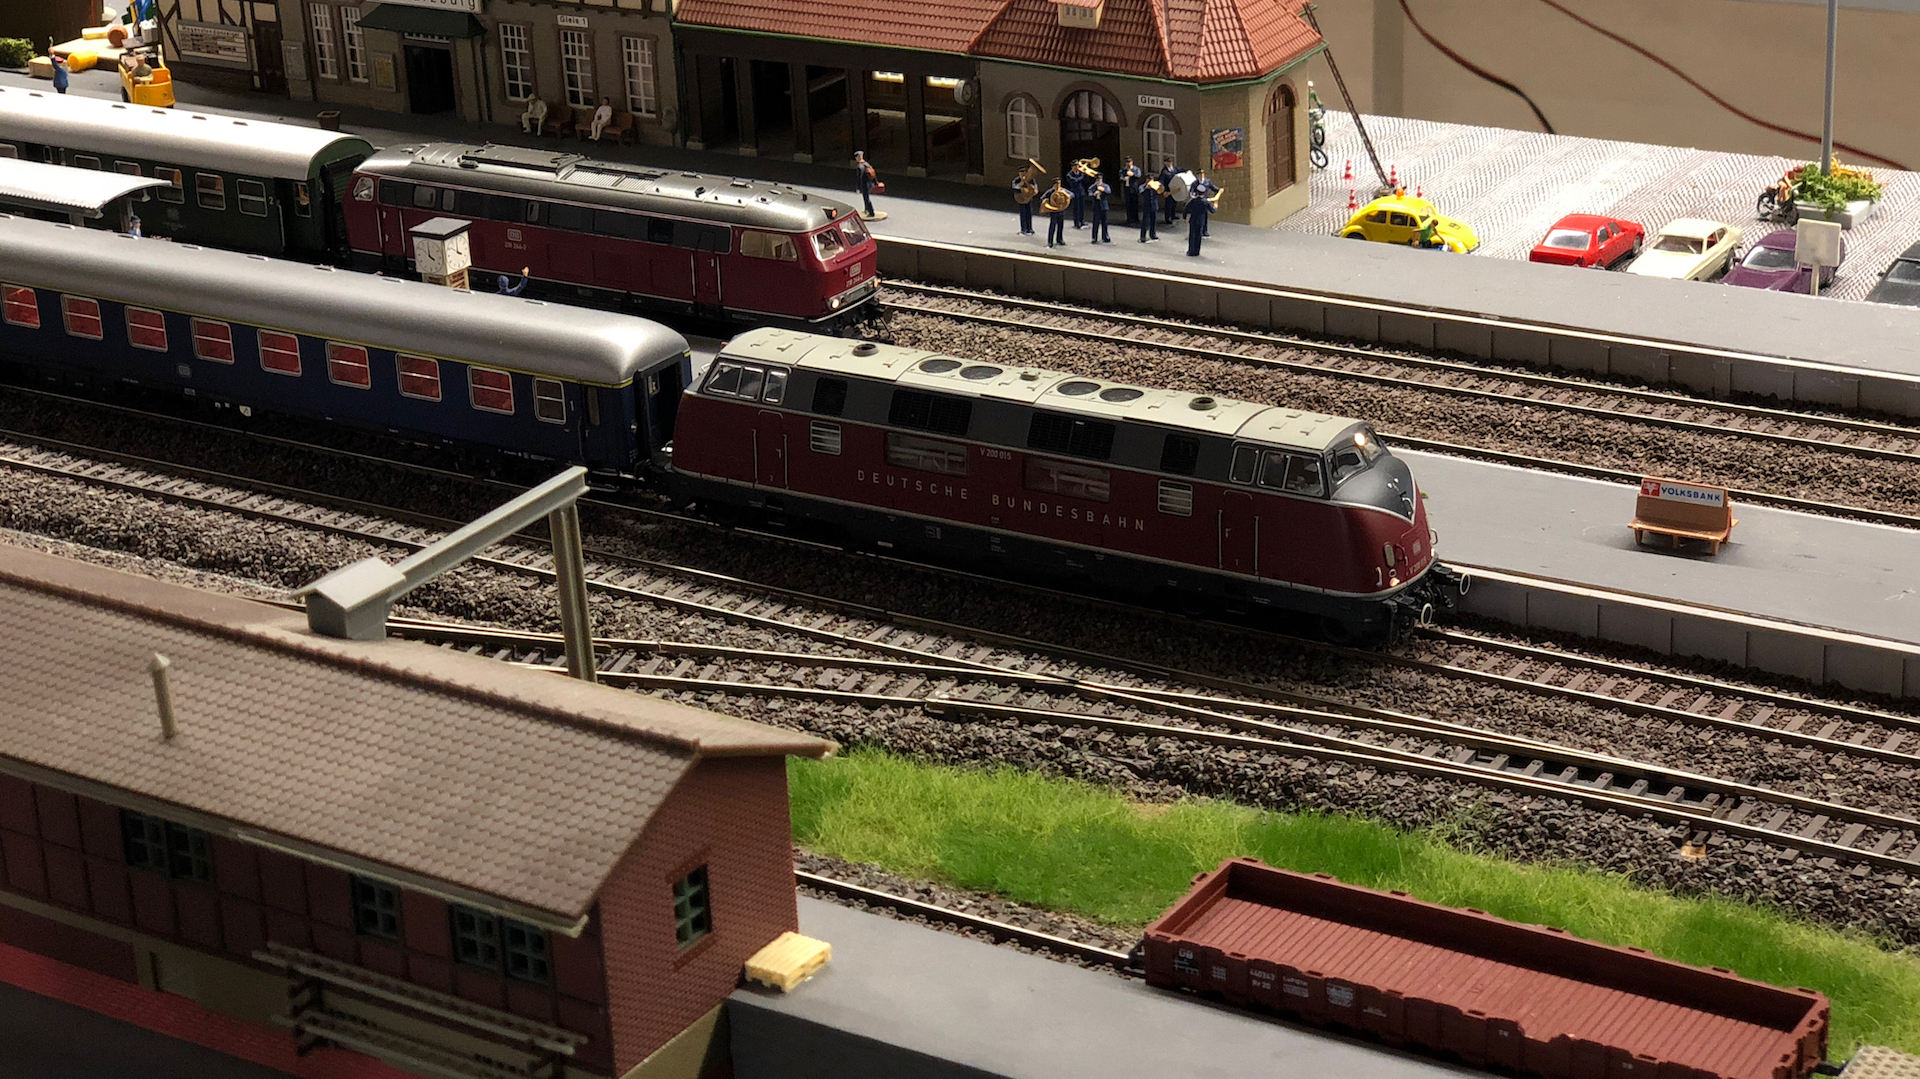 18_02_24_Schautag-Eisenbahnfreunde-Hameln_006